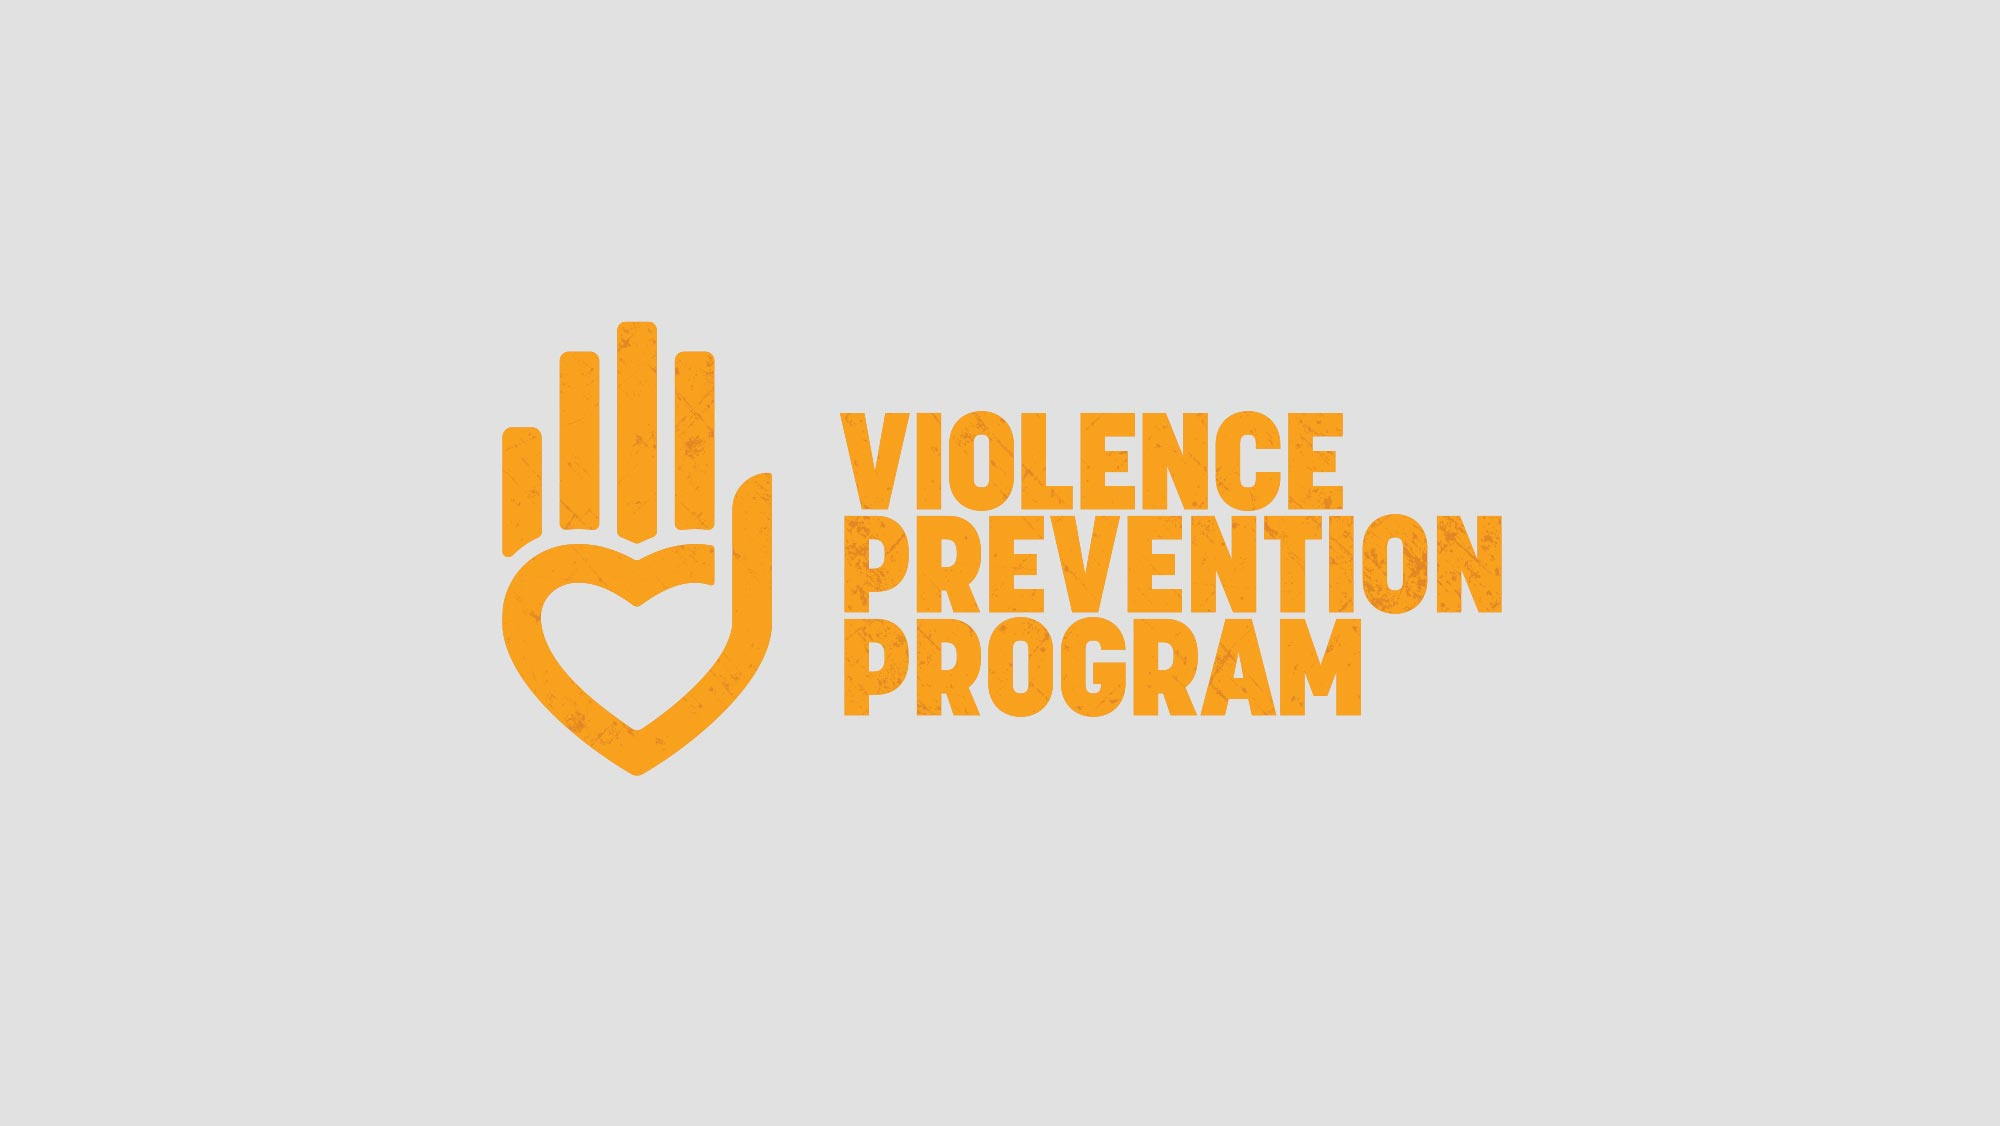 Violence Prevention Program Logo & Identity Design